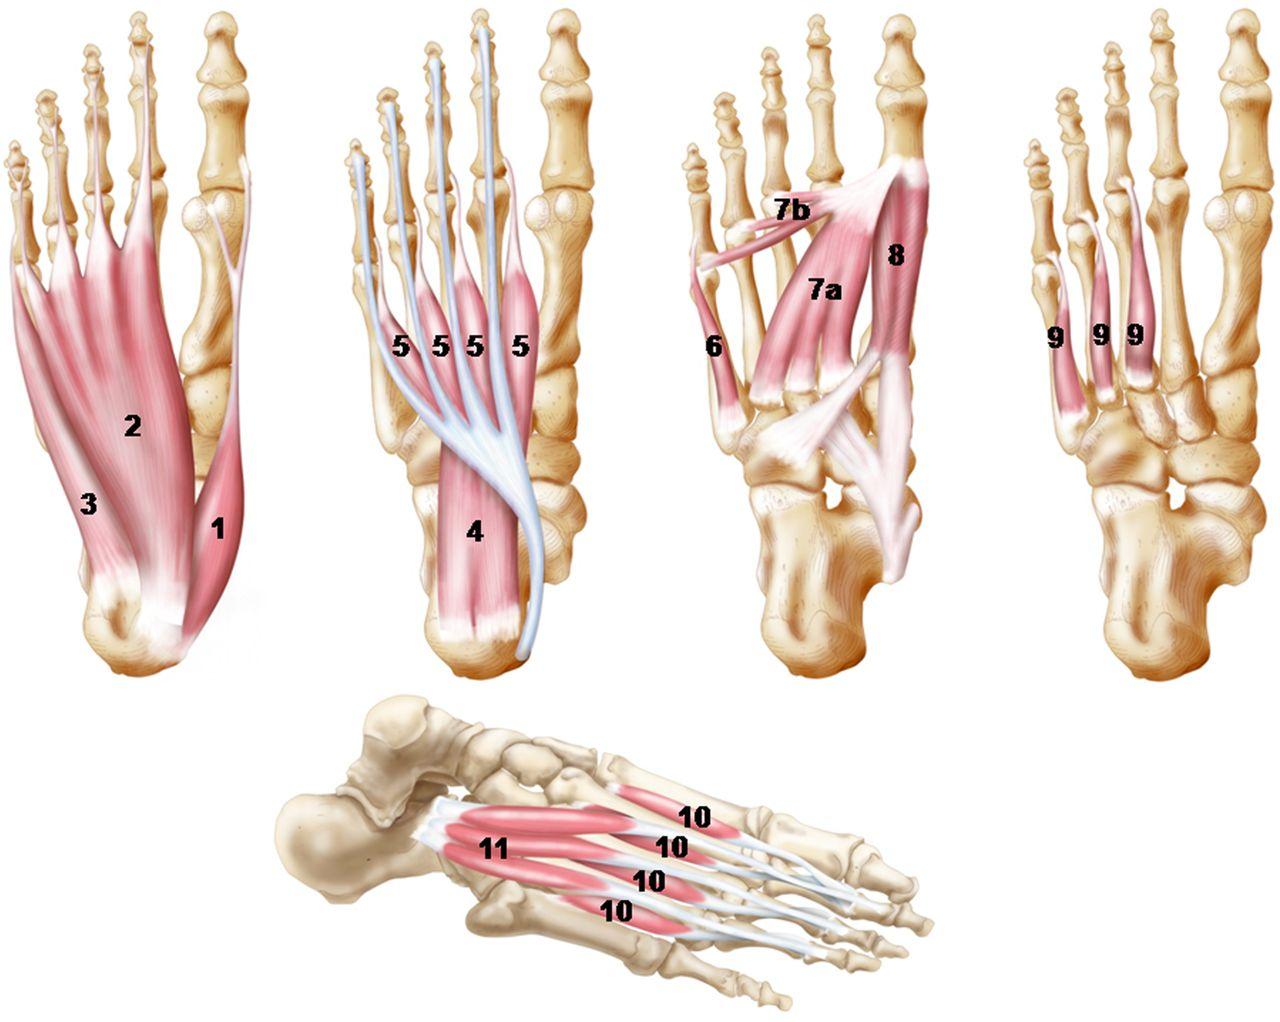 Tibialis Posterior Origin And Insertion